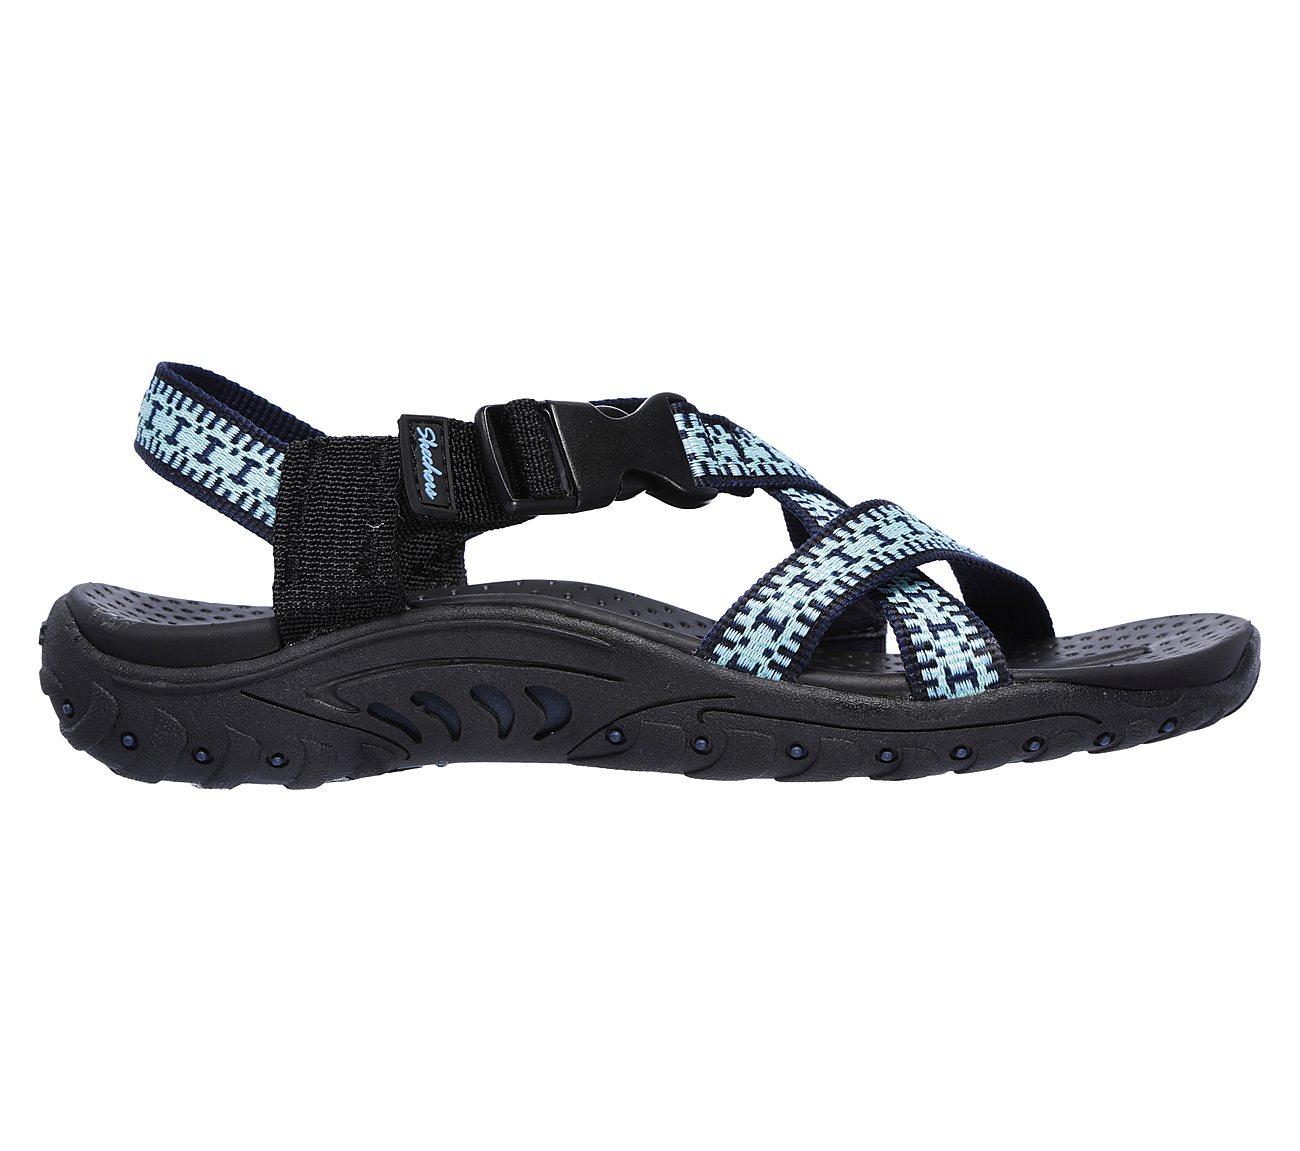 skechers reggae sandals review